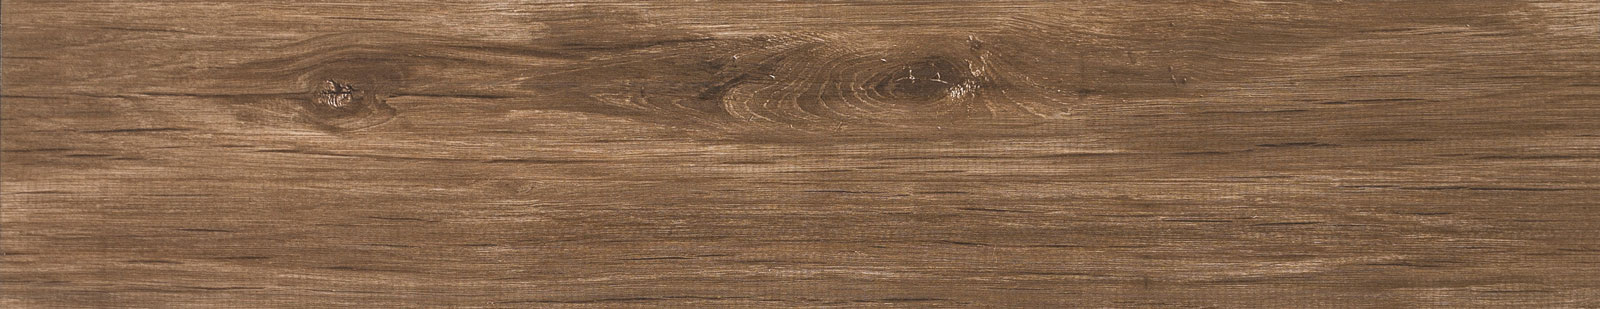 DLO1650 – Nut